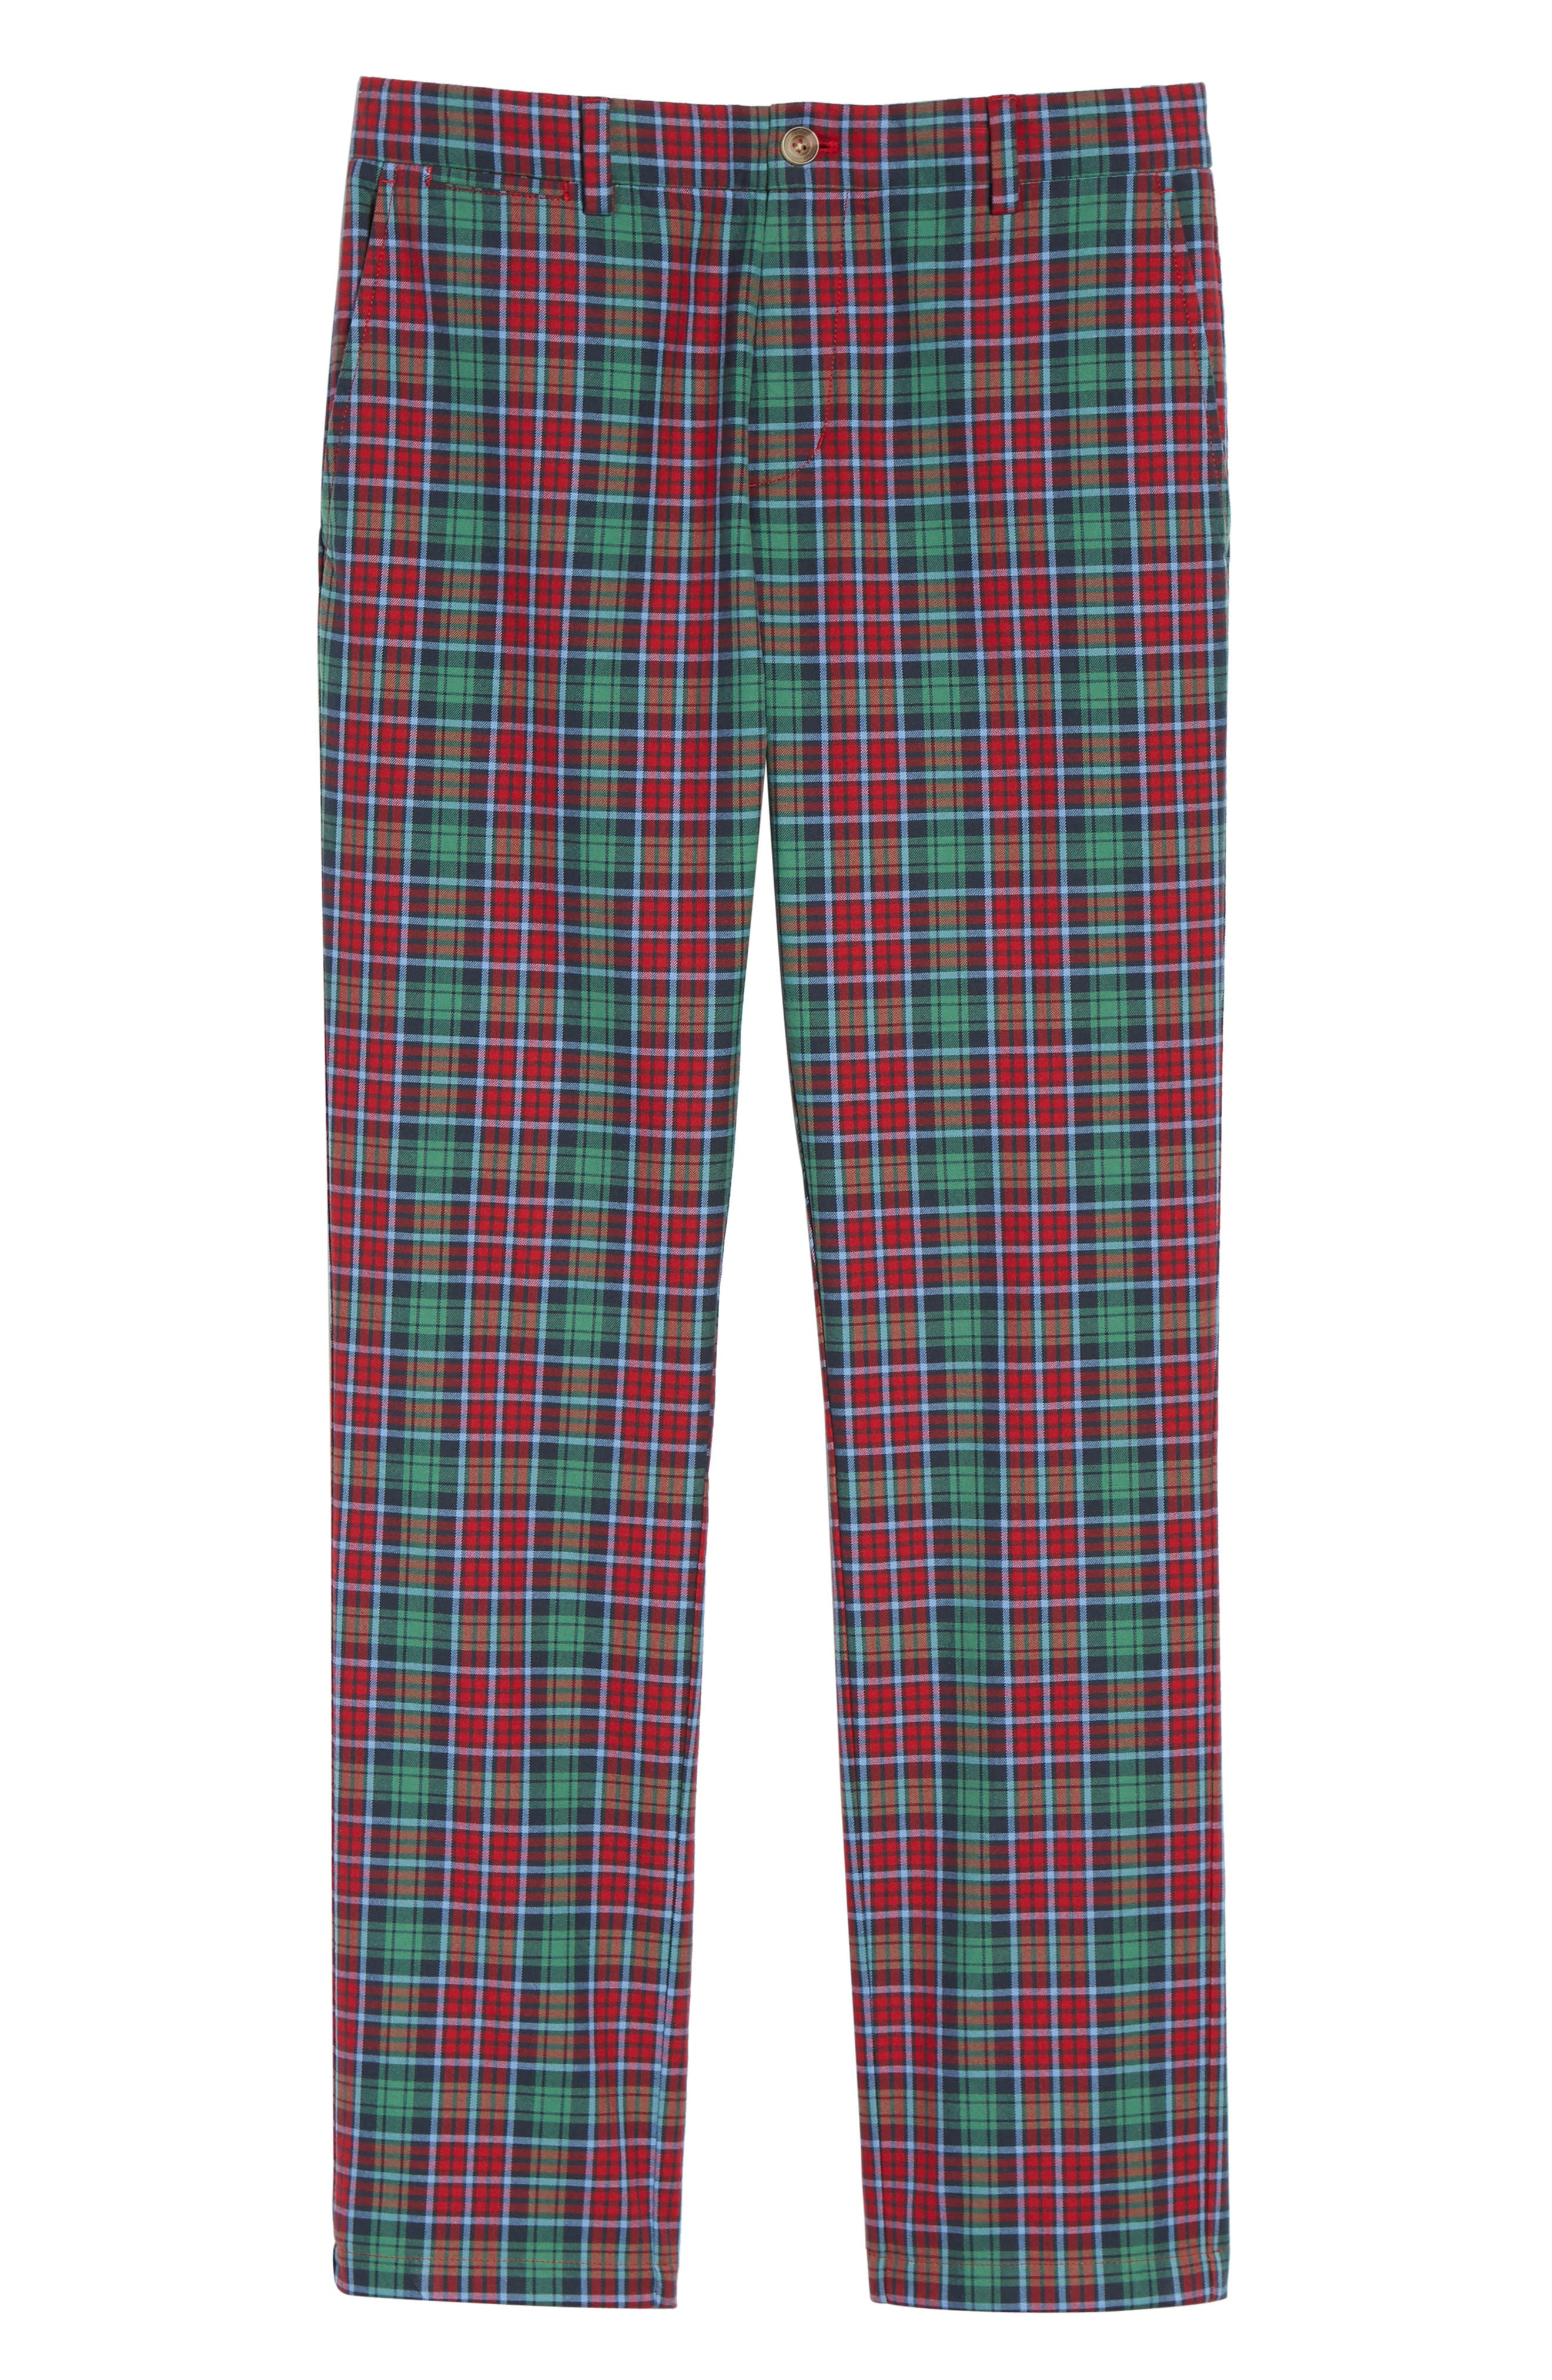 Leddy Park Slim Plaid Pants,                             Alternate thumbnail 6, color,                             342